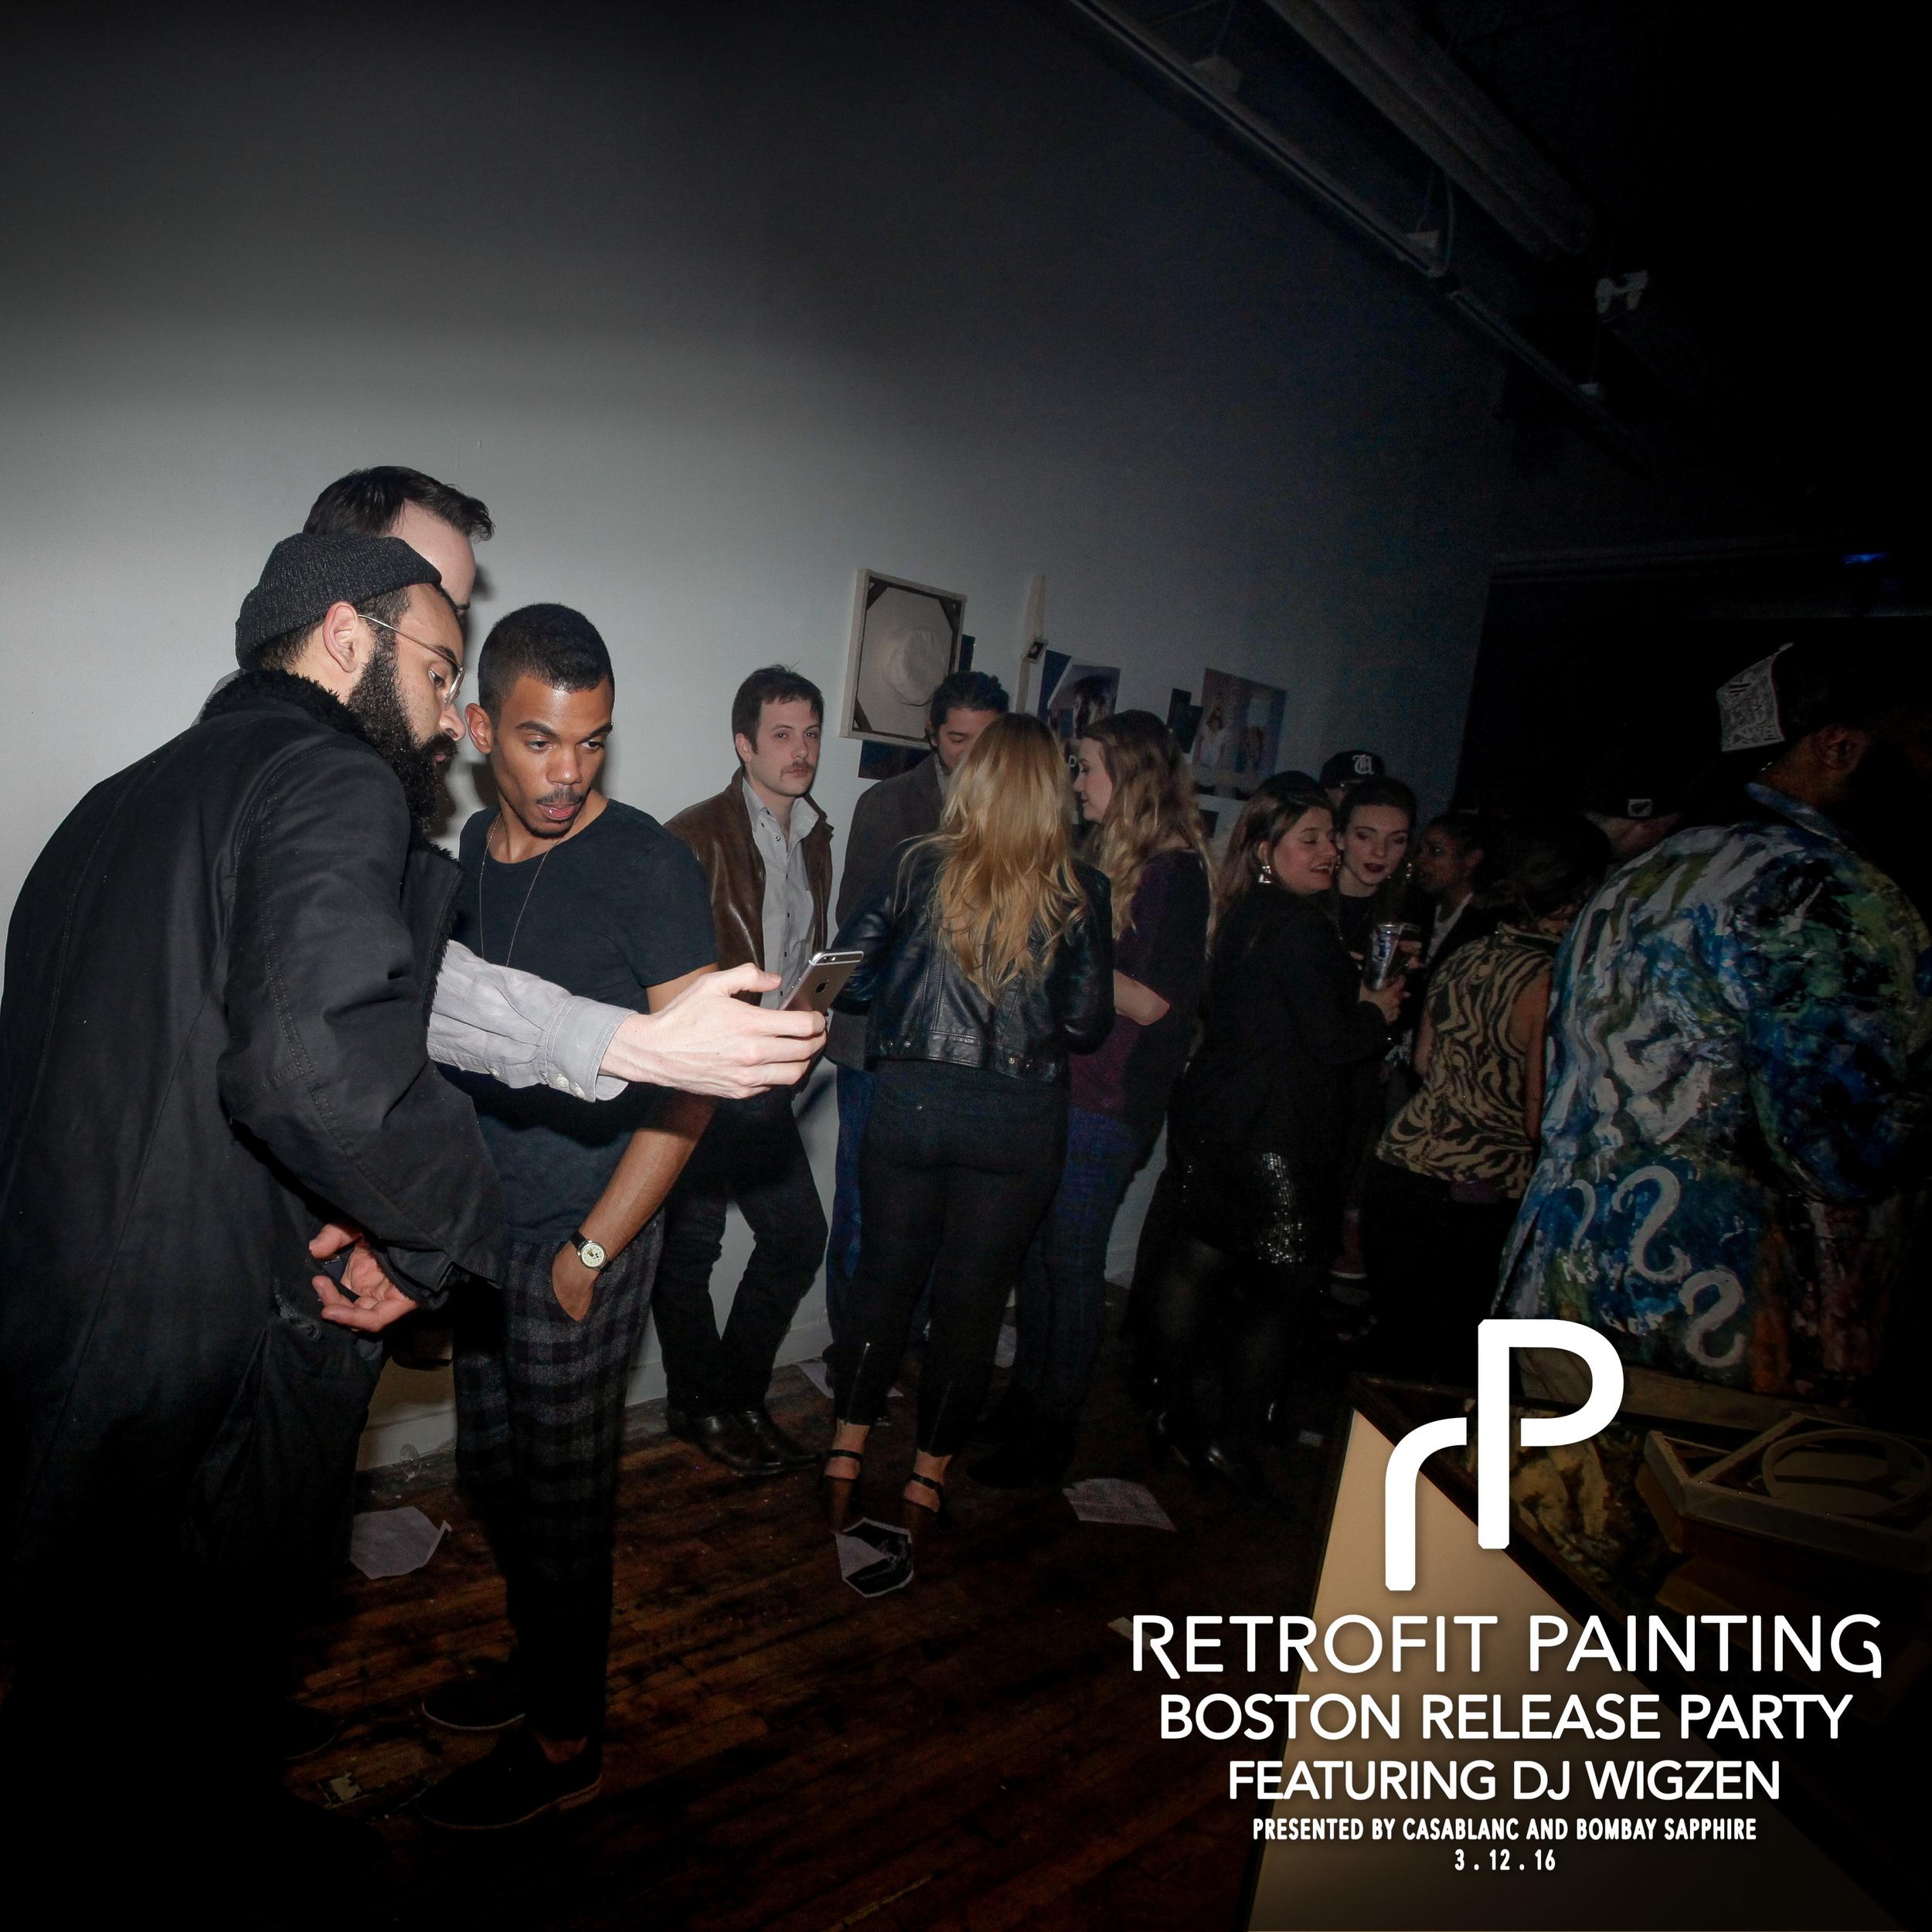 Retrofit Painting Boston Release Party 0146.jpg